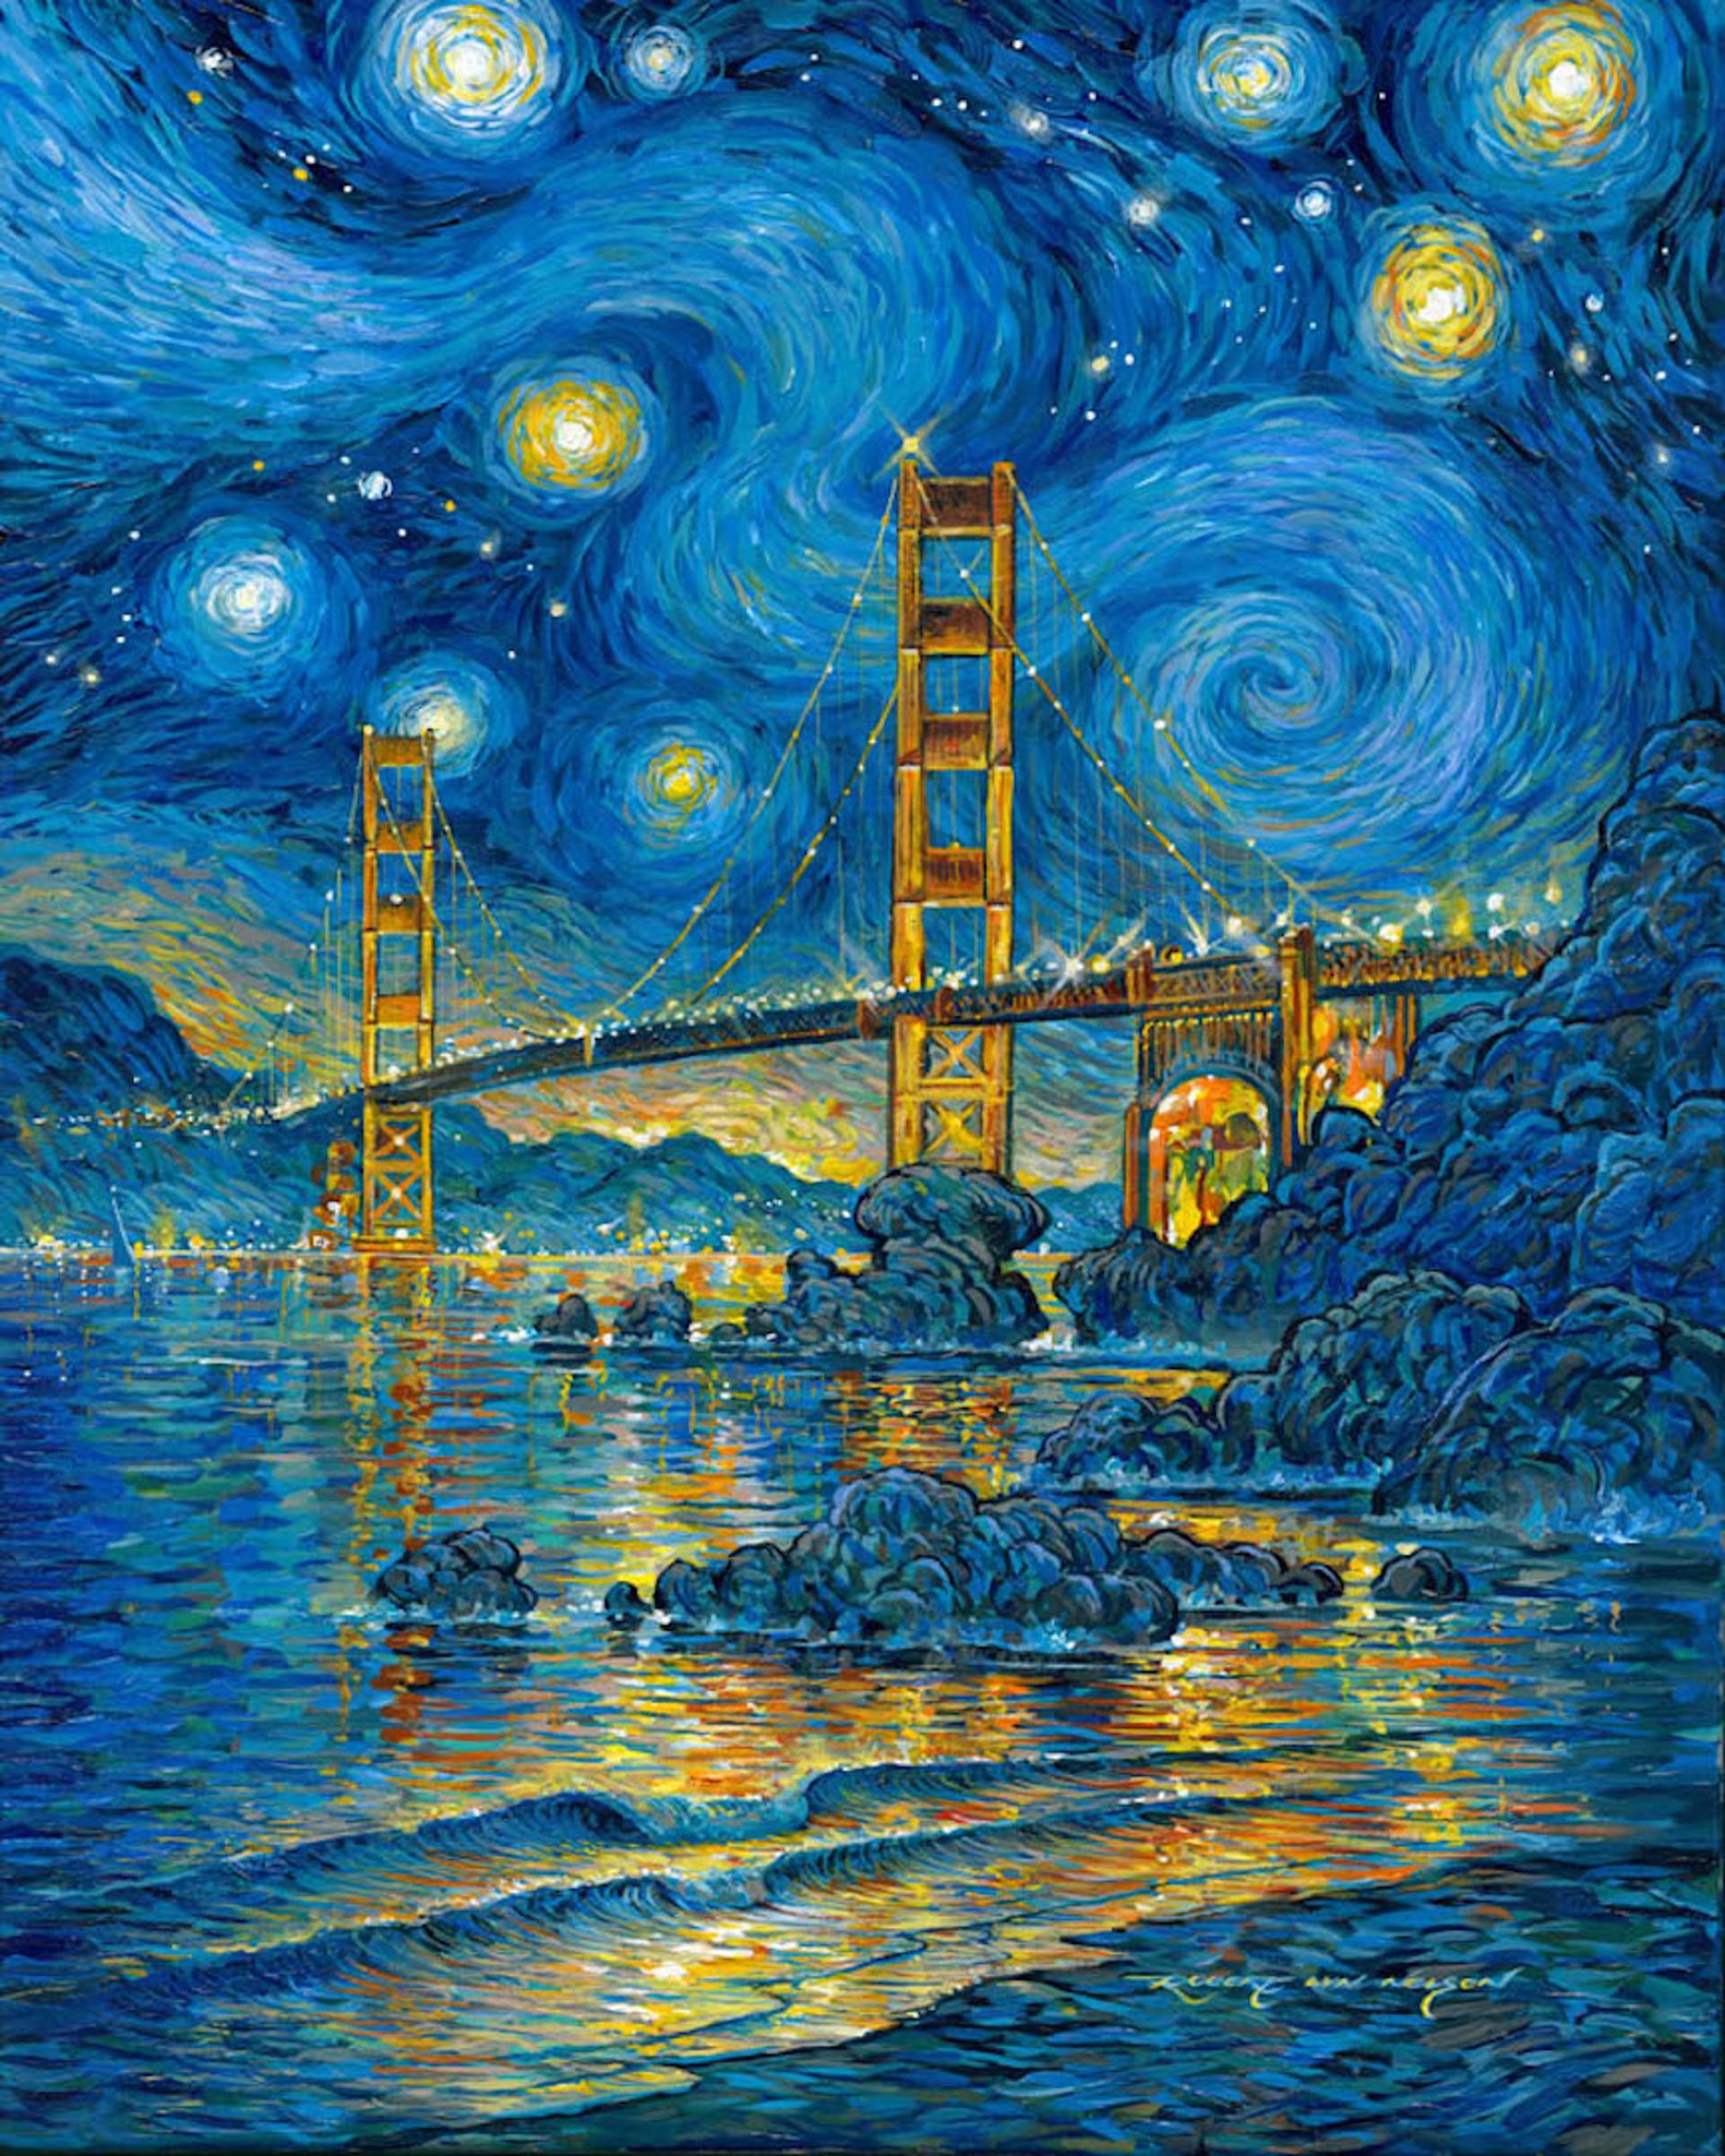 San Francisco Moods by Robert Lyn Nelson